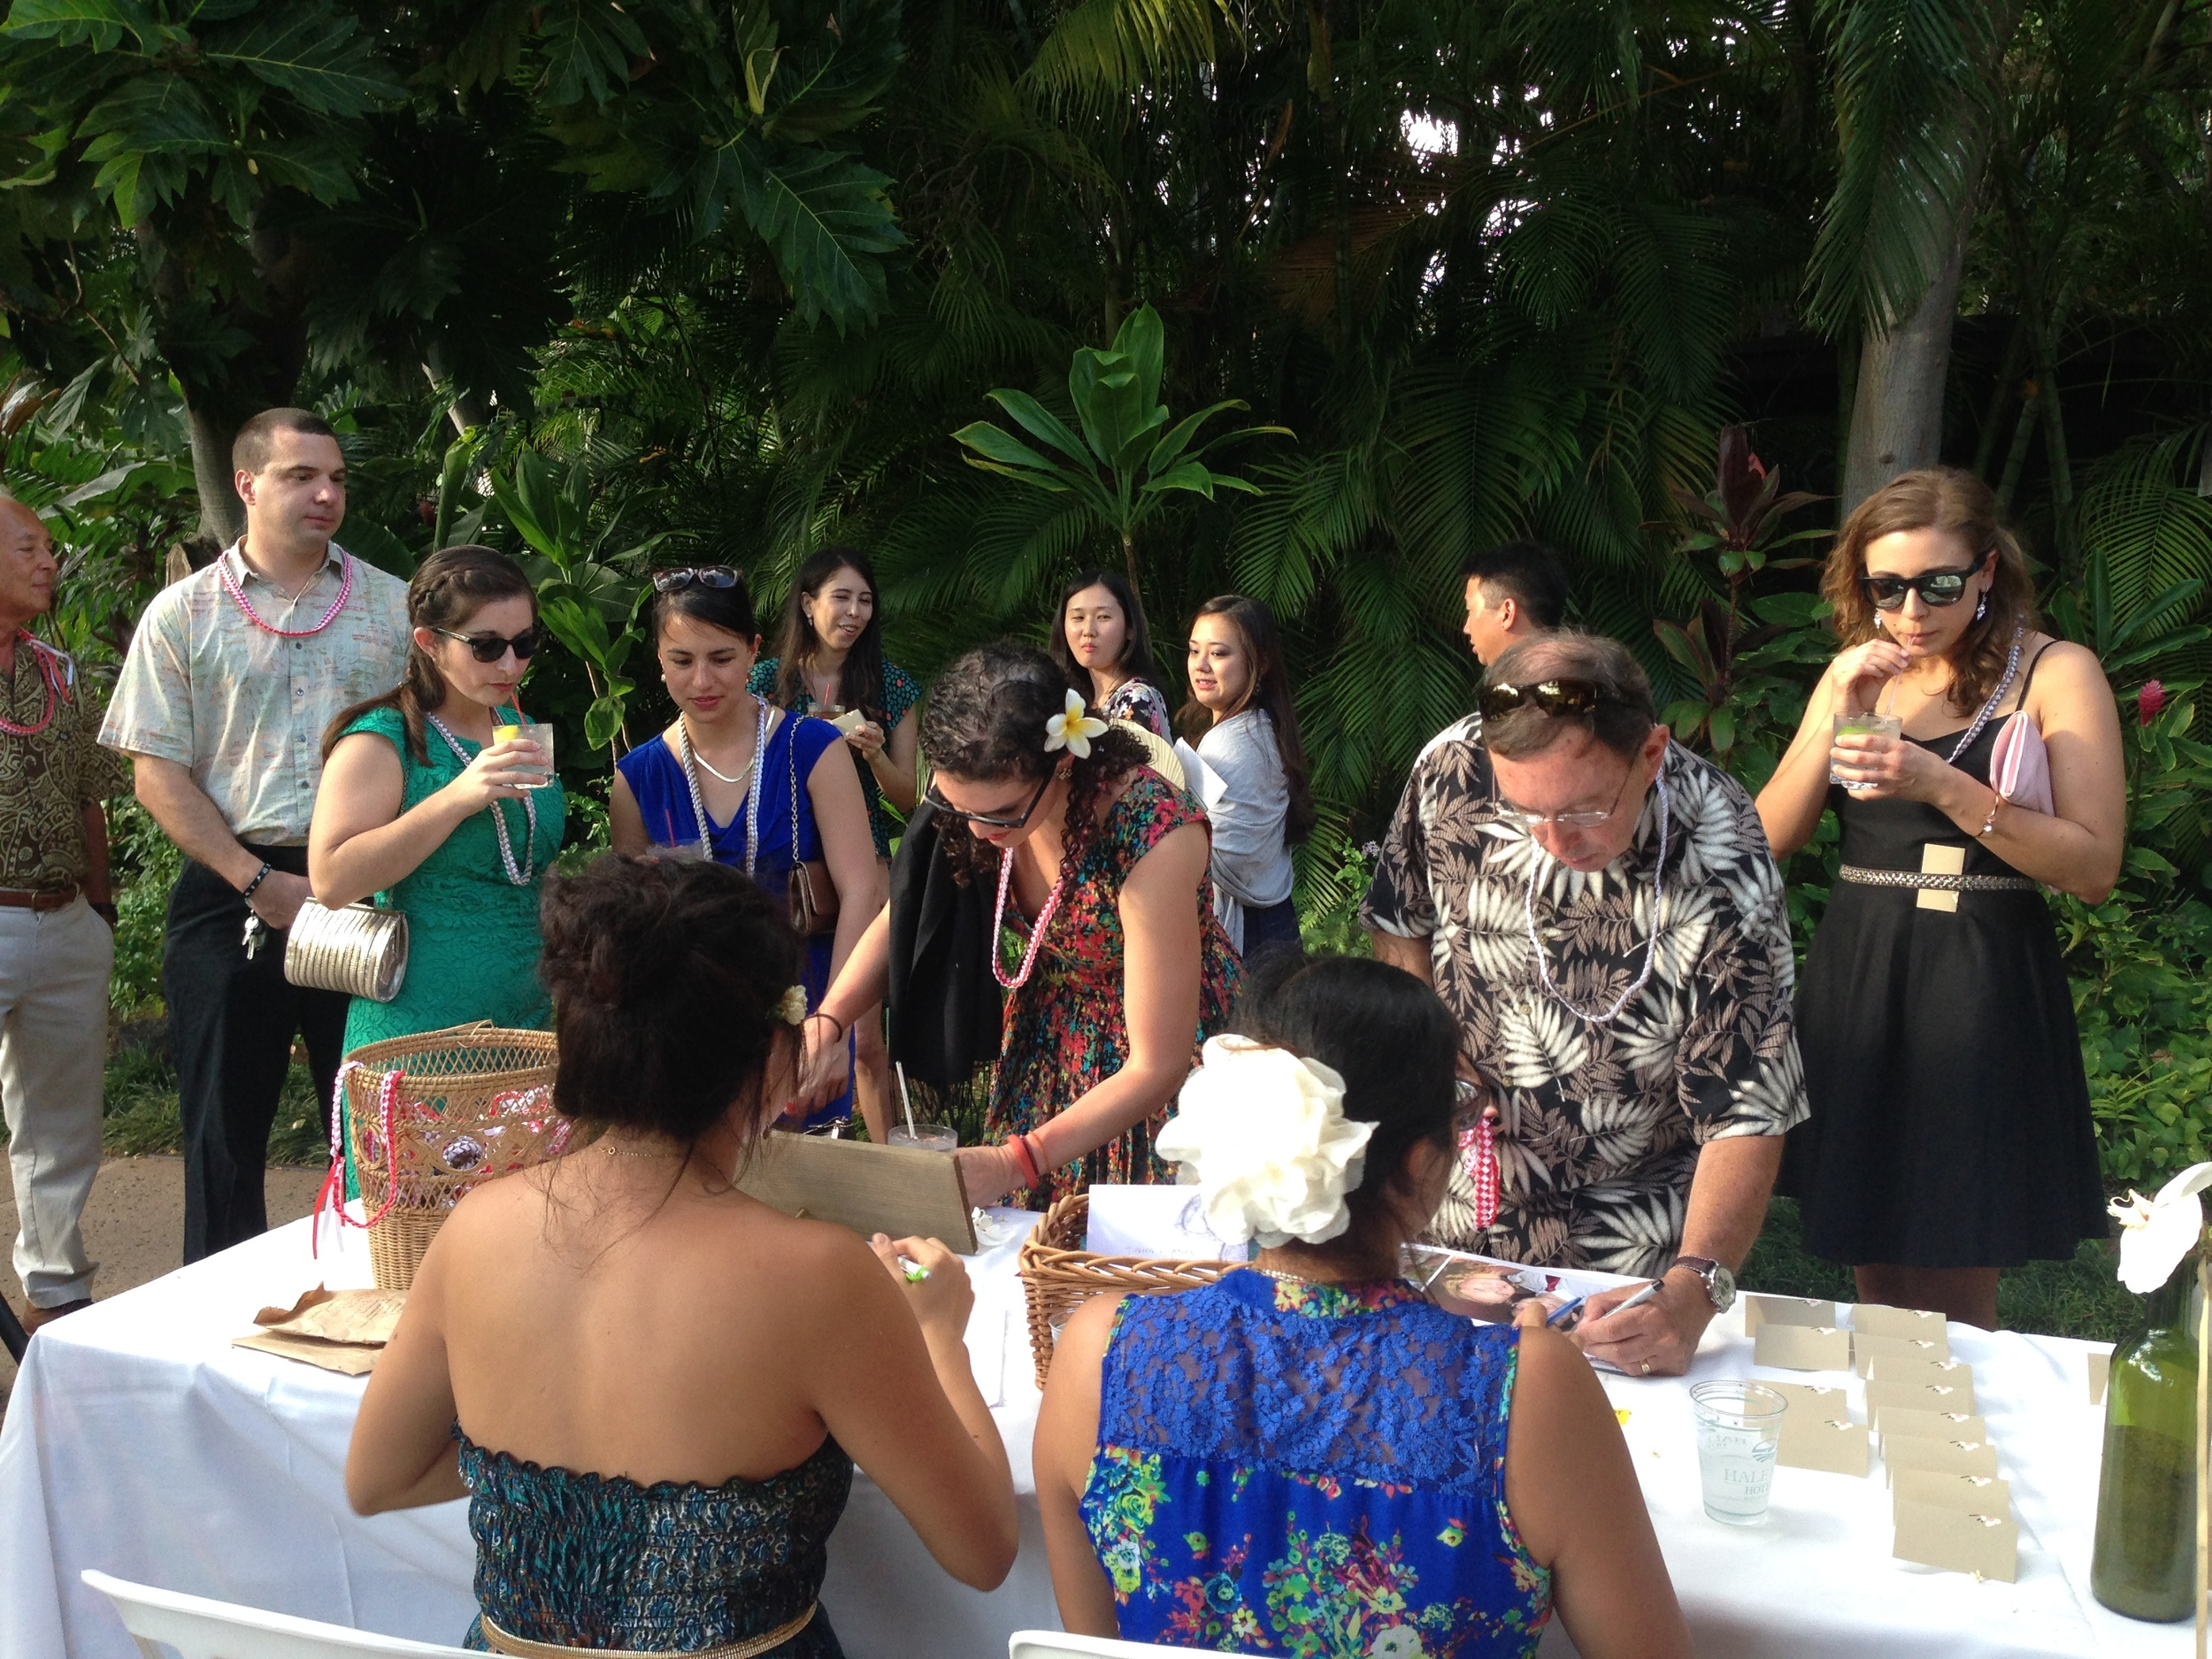 9-hale-koa-wedding-guests.JPG